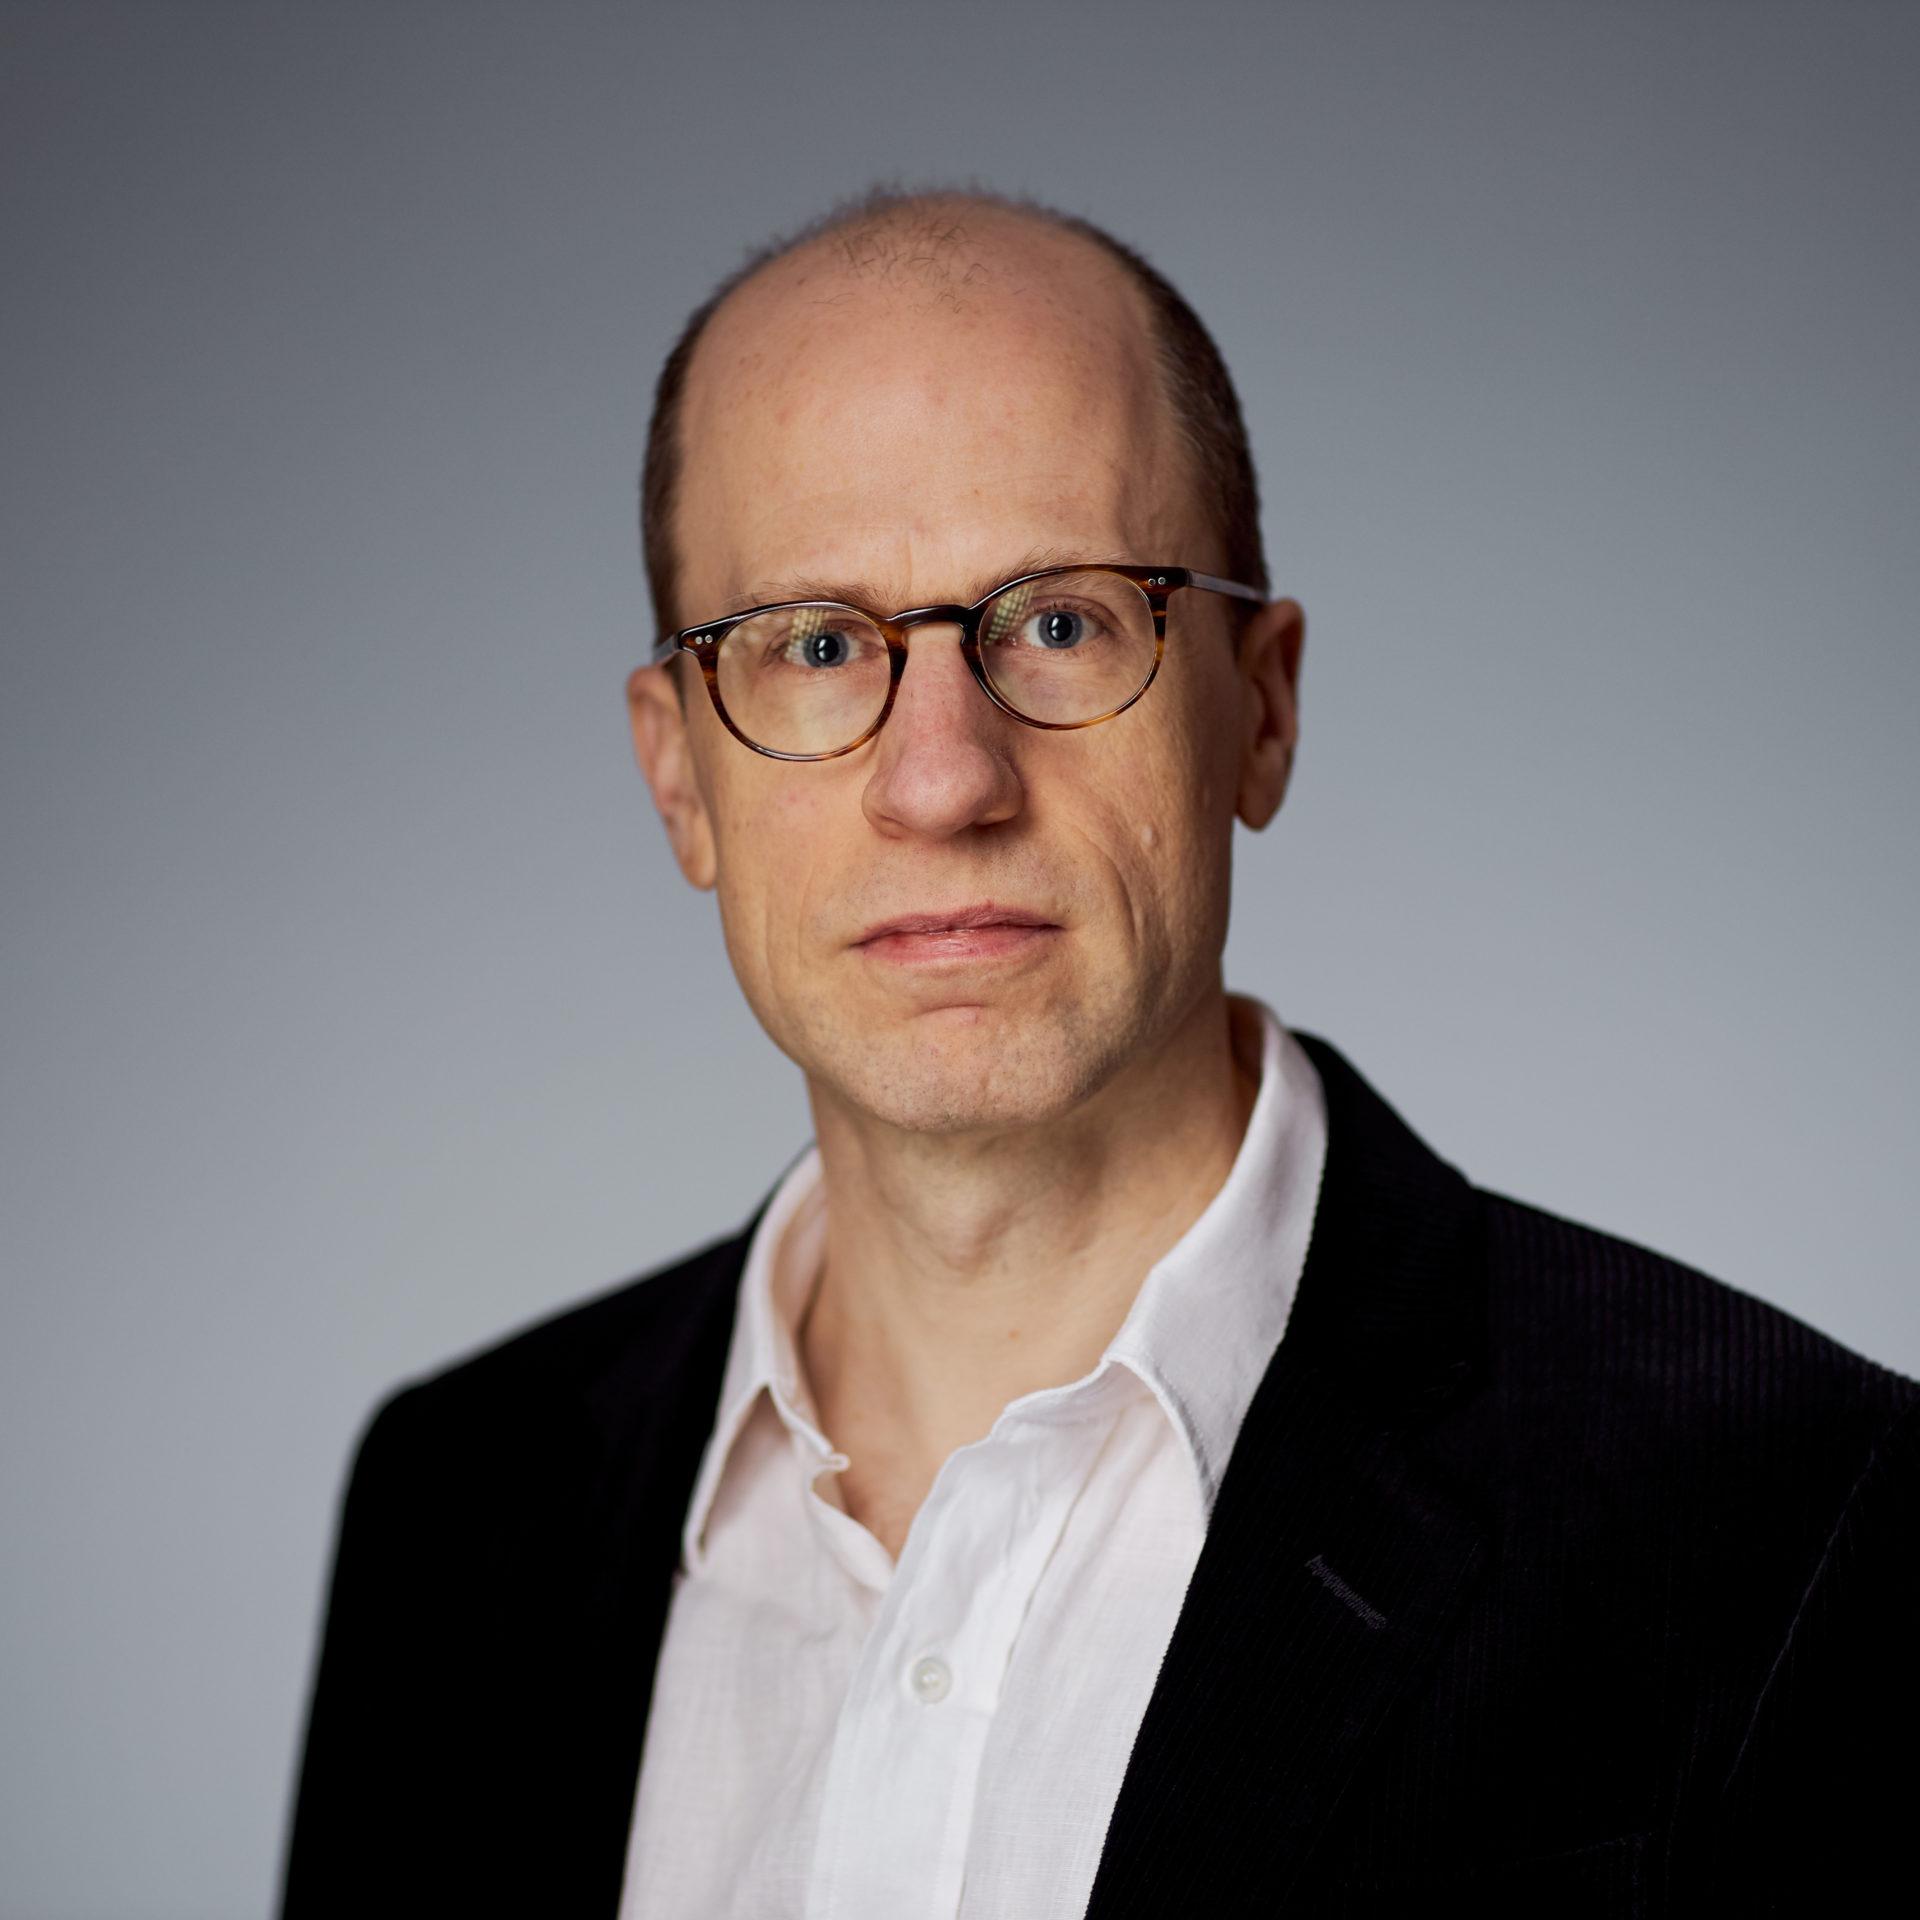 Professor Nick Bostrom